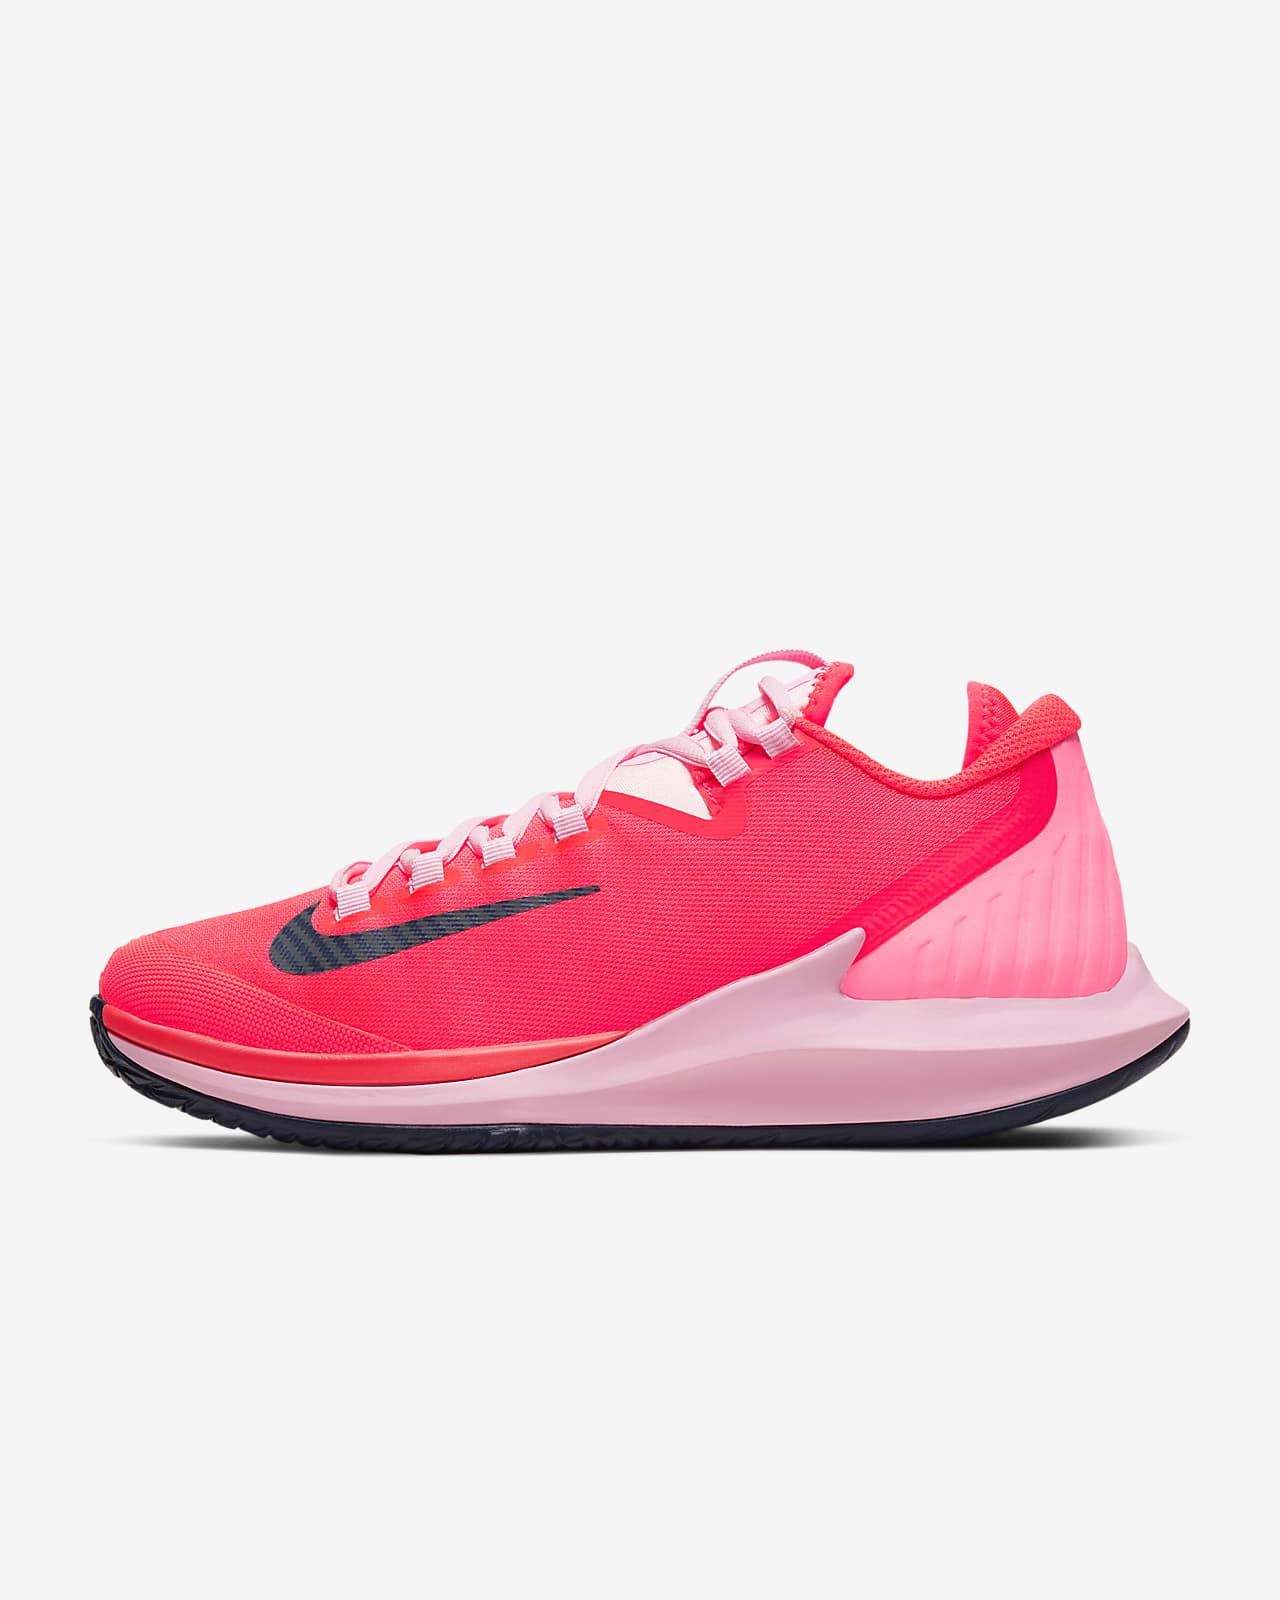 NikeCourt Air Zoom Zero Women's Tennis